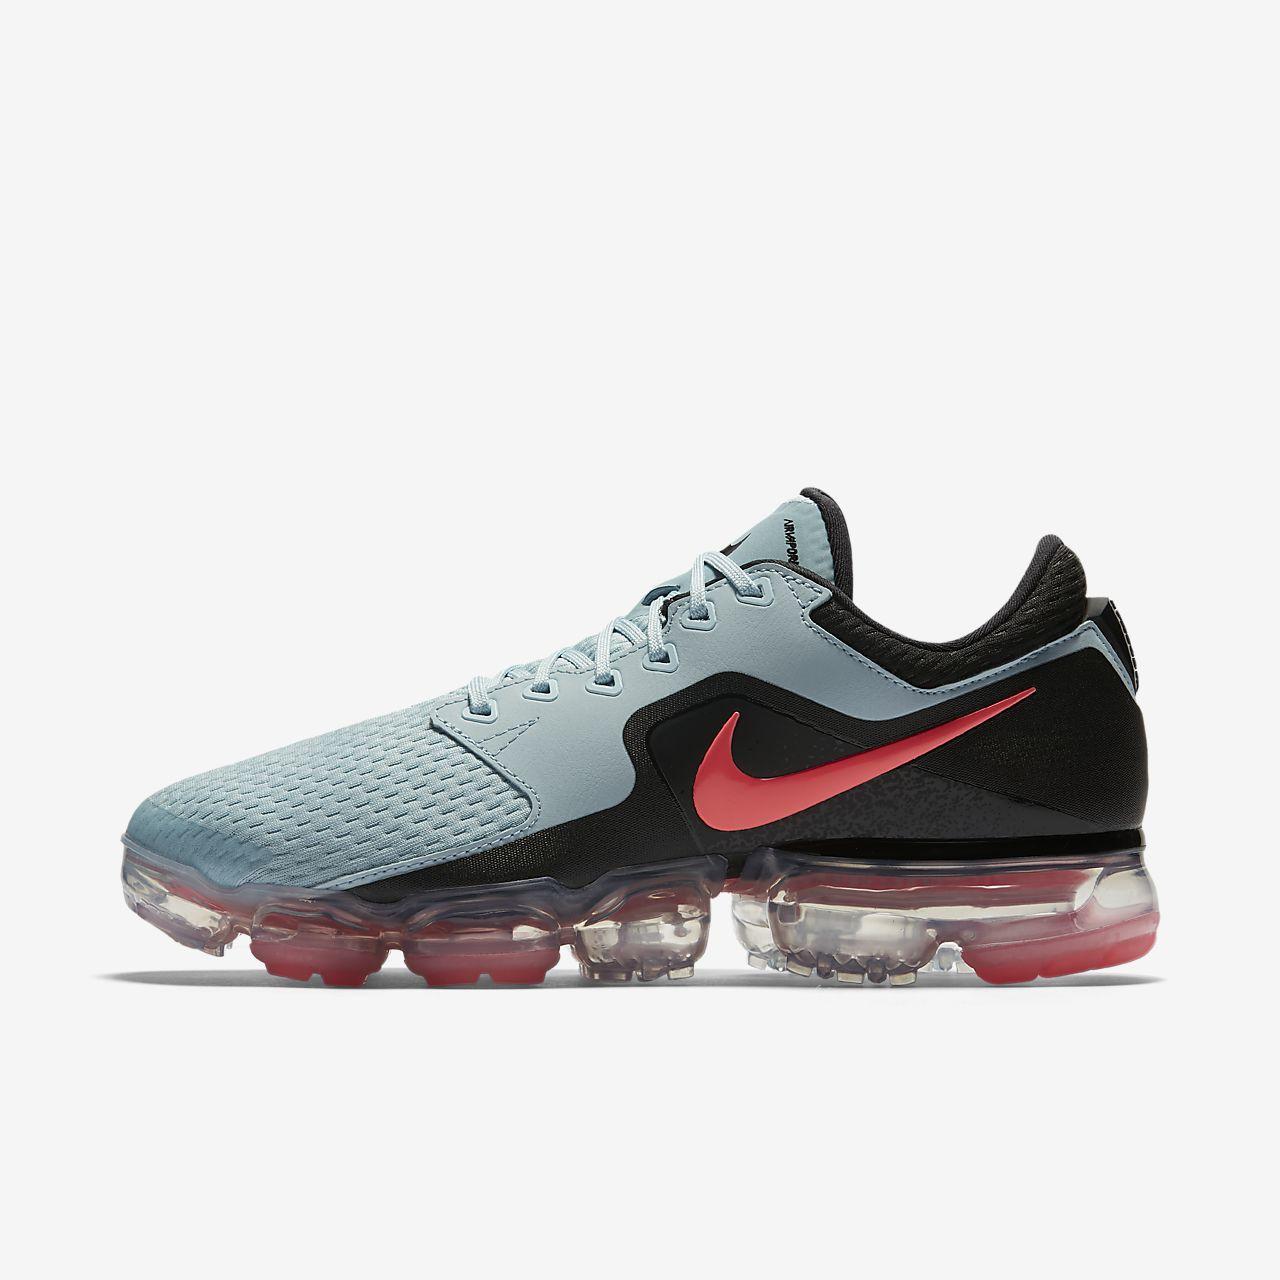 Nike Air VaporMax-sko til kvinder